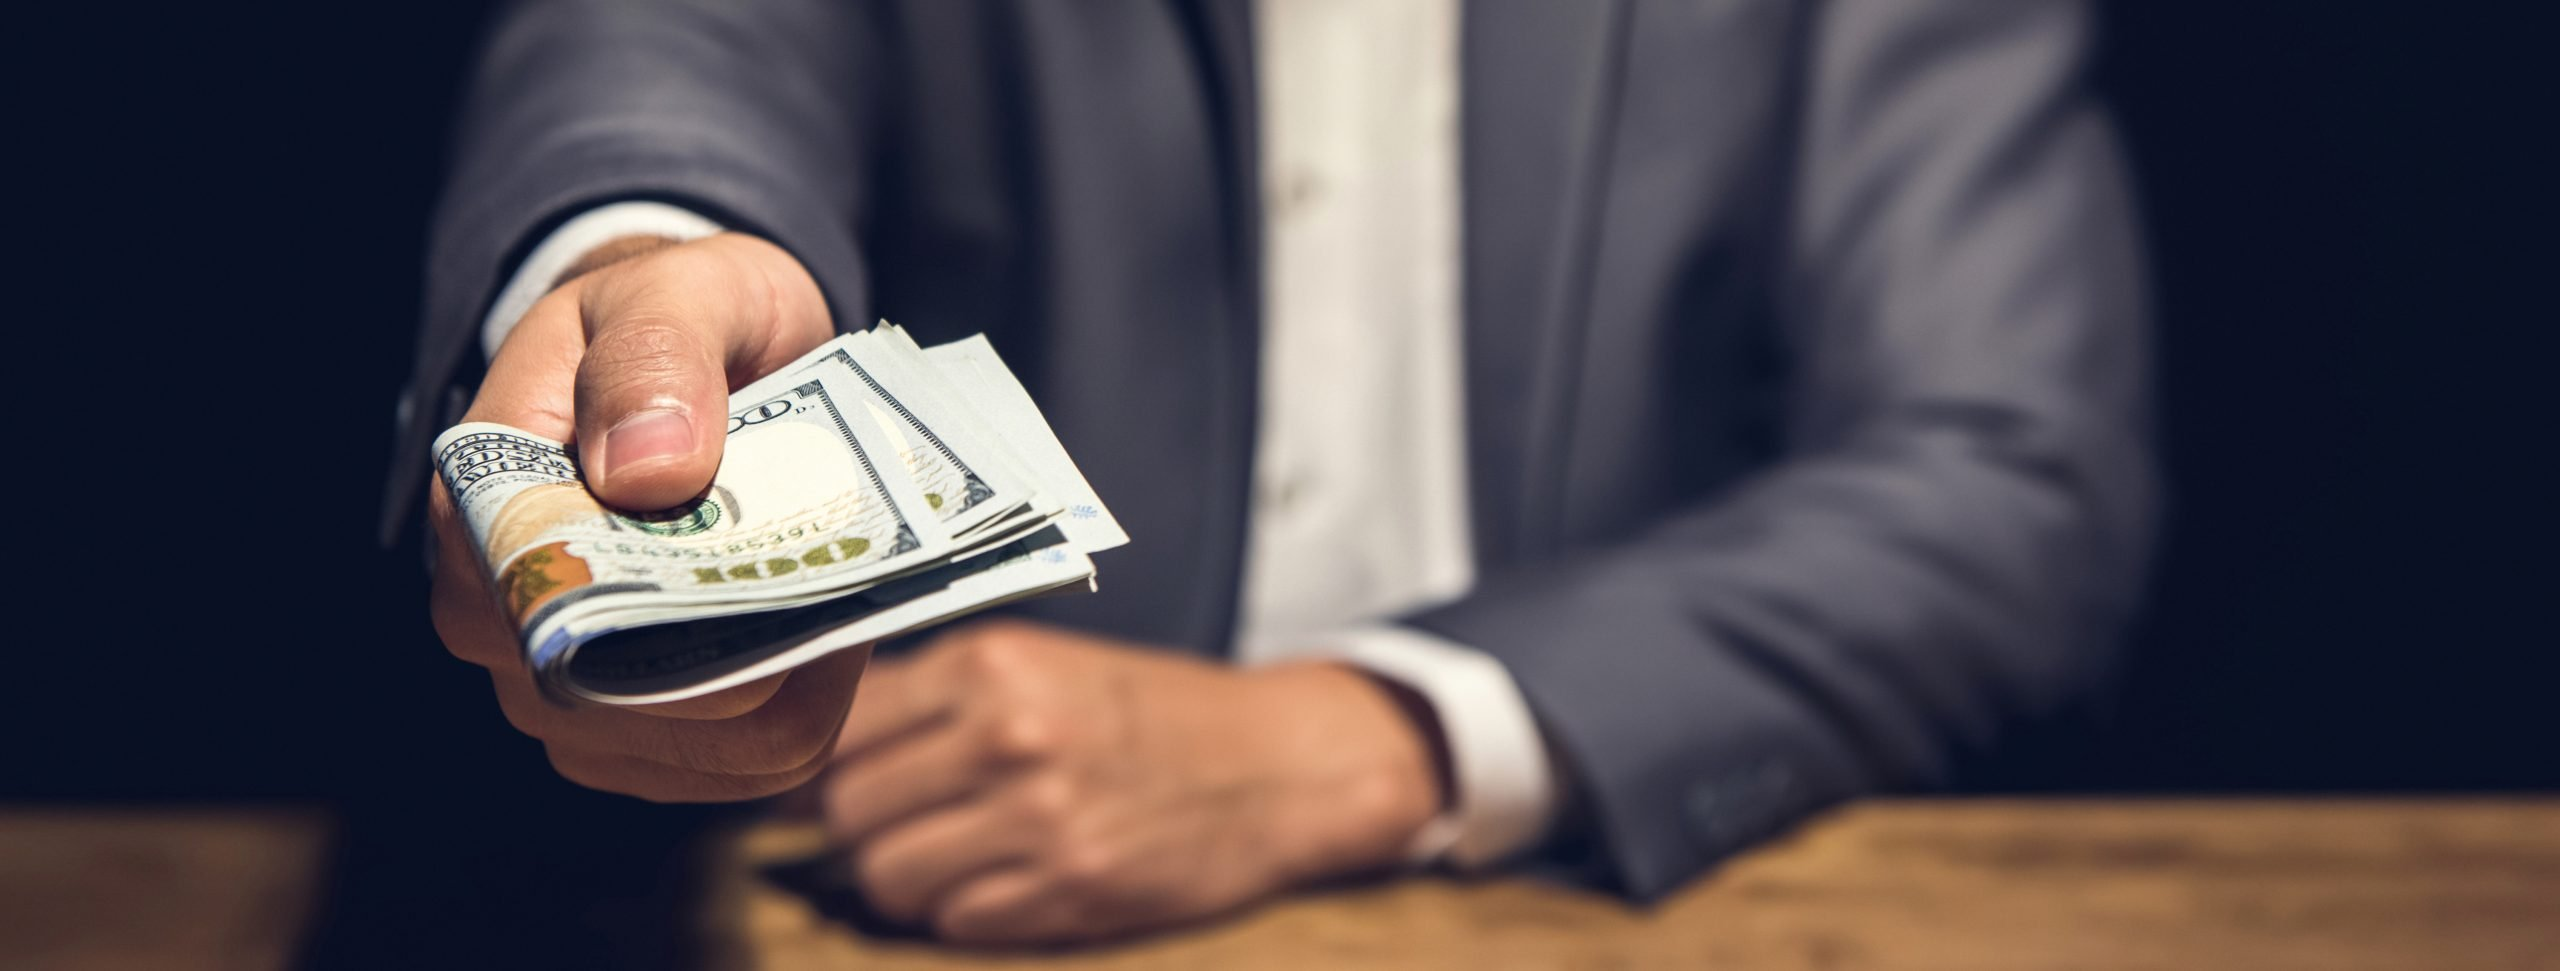 bisnis keuangan